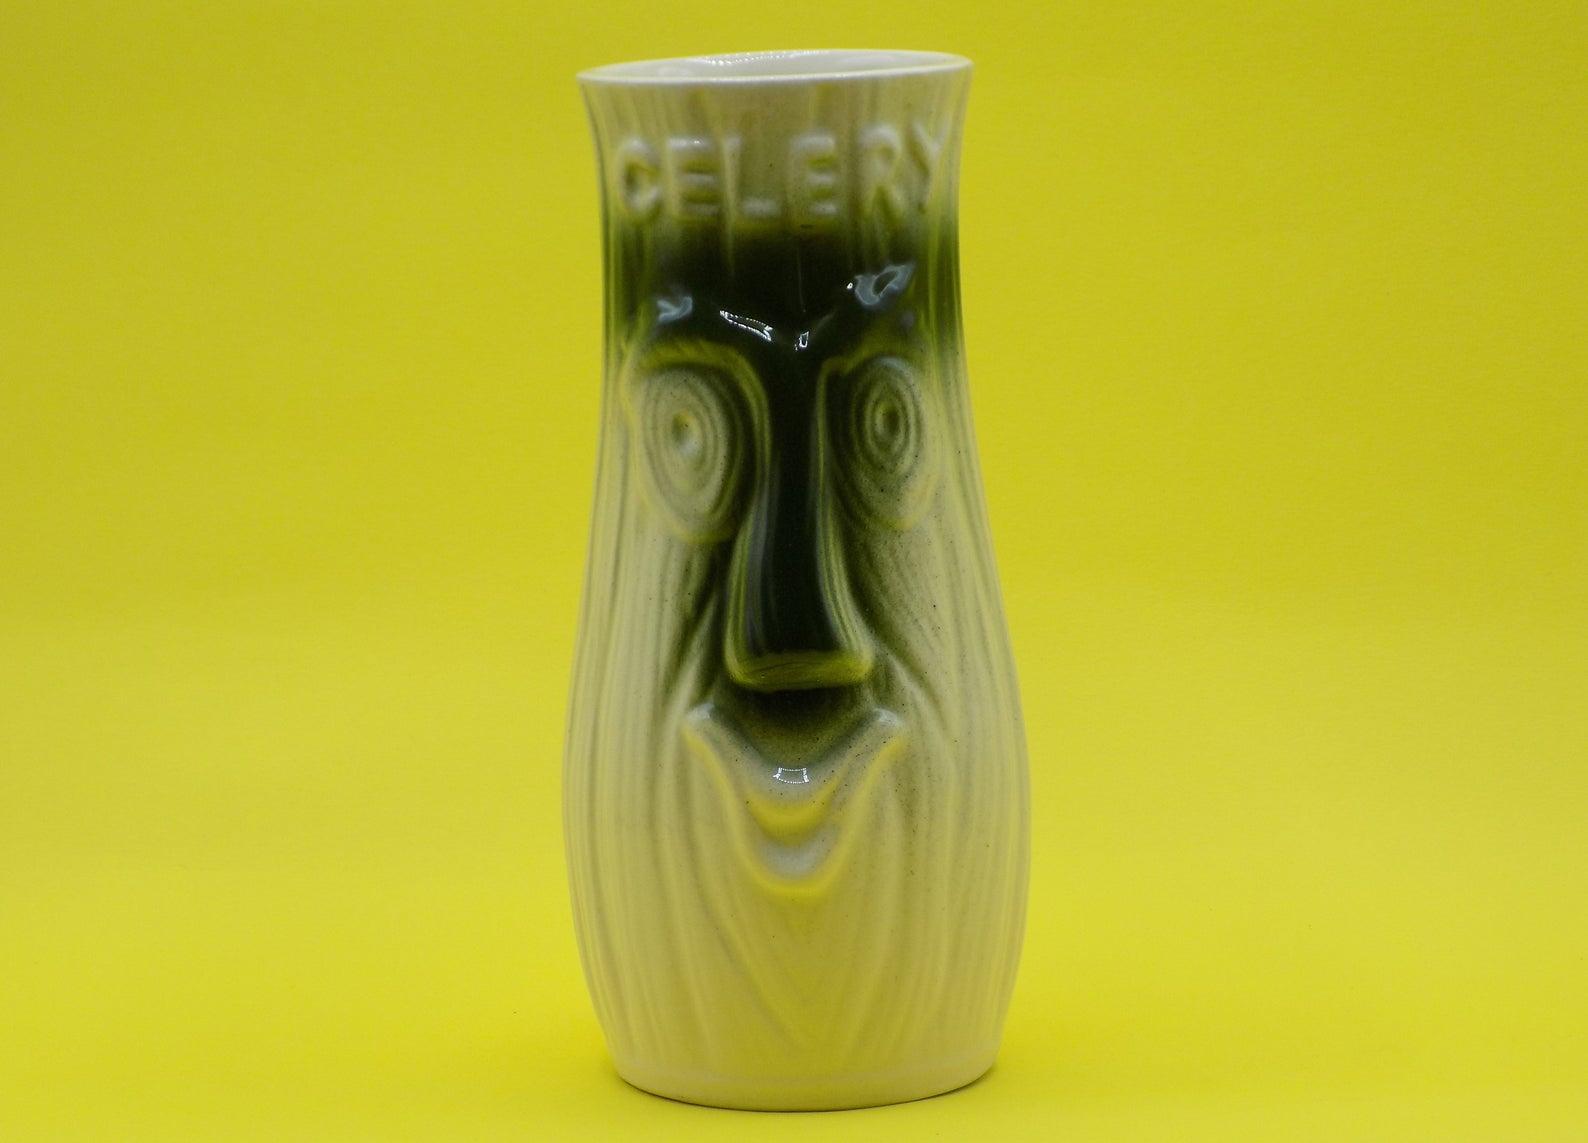 A vintage celery vase, shaped like celery with a face